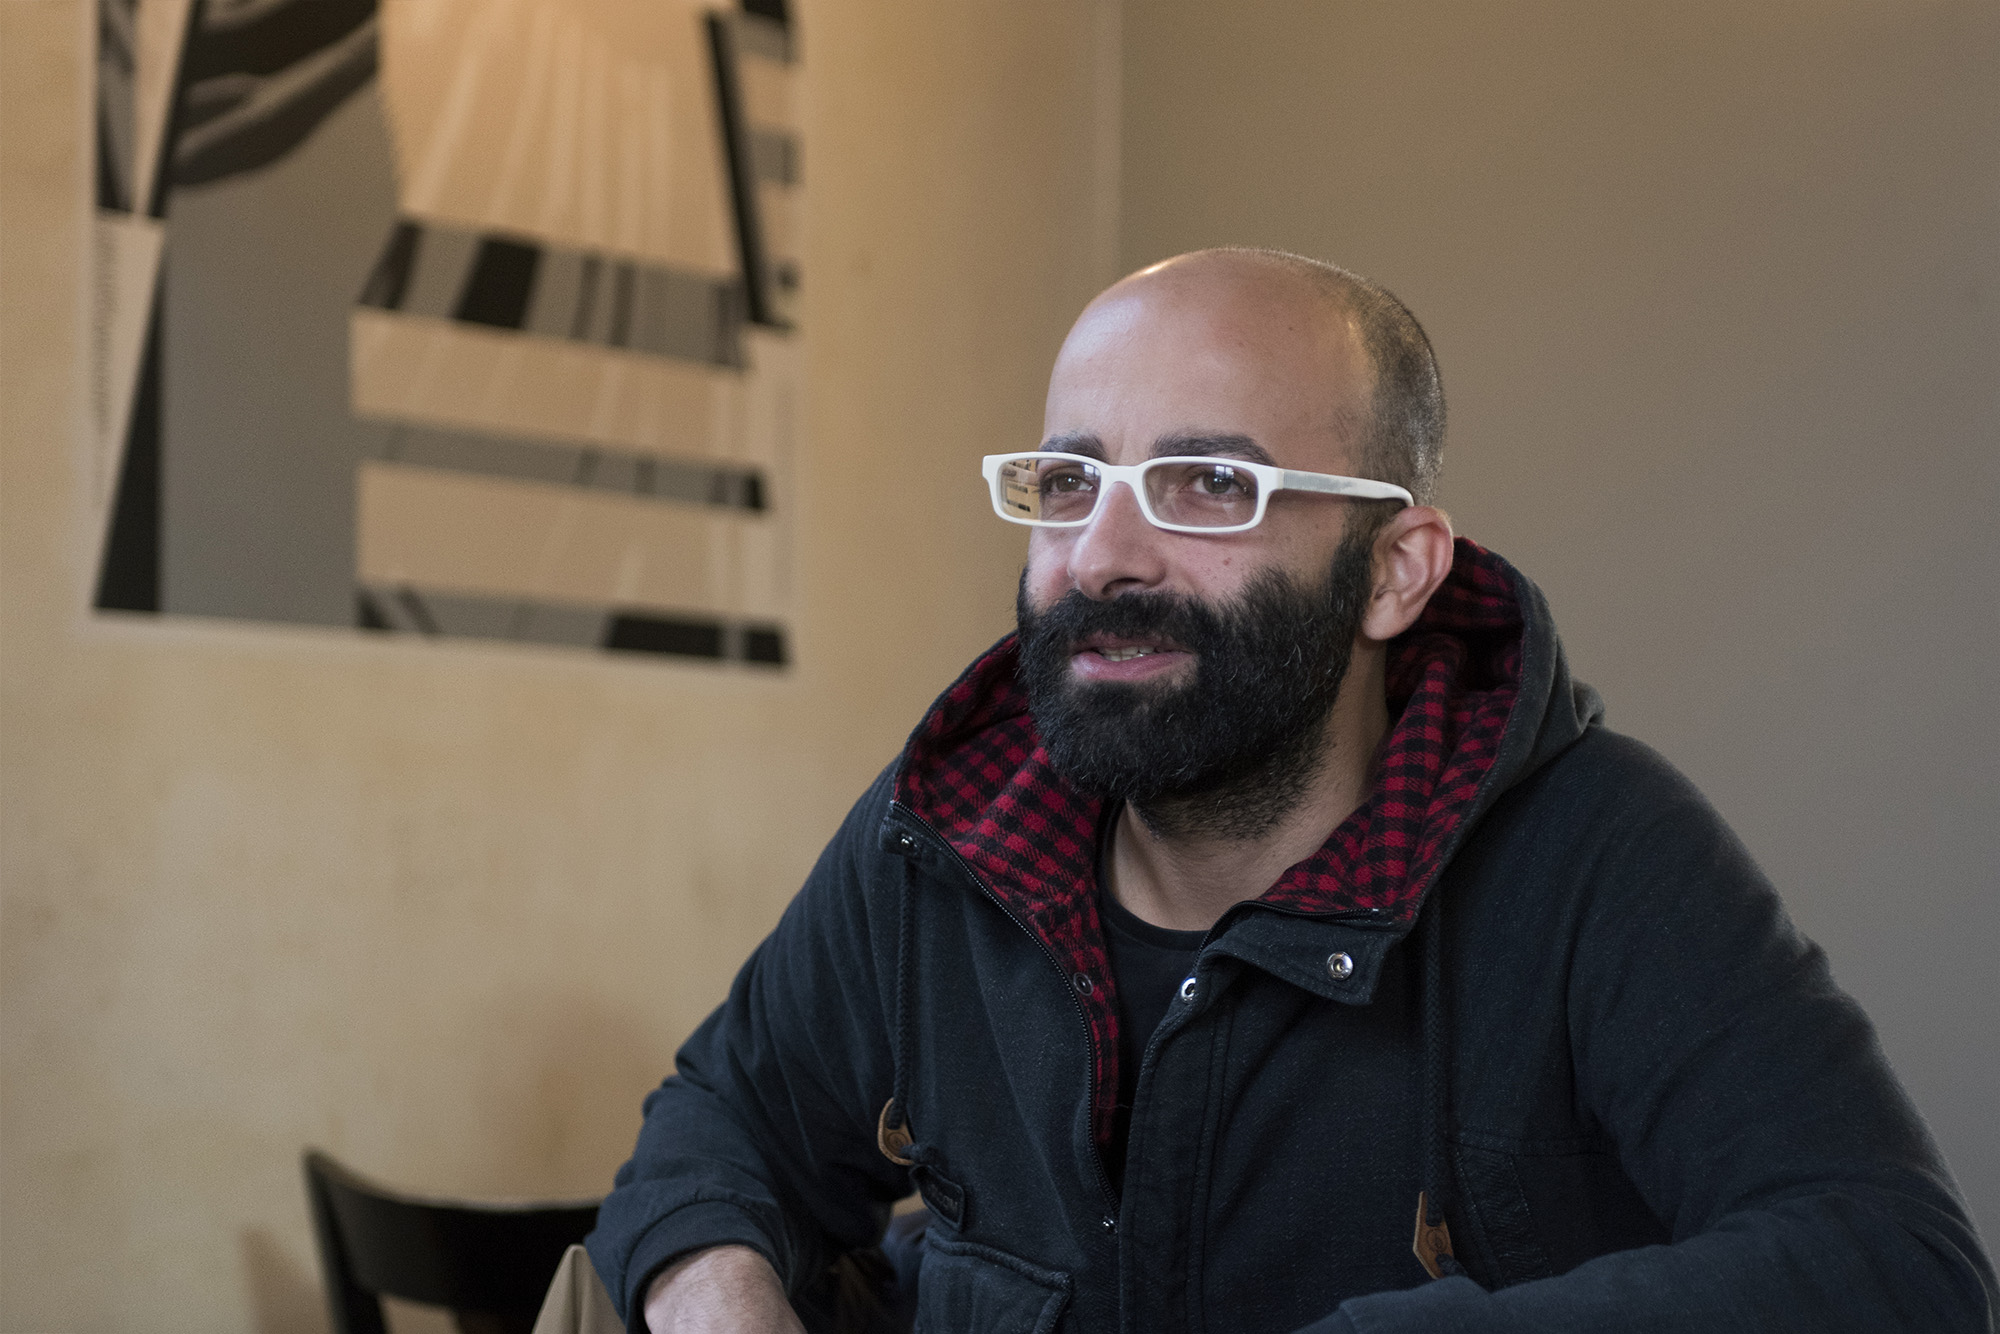 30.10.17, Basel, Matteo Leoni, Koch, pureTaste, foodfast, Photo by Aissa Tripodi